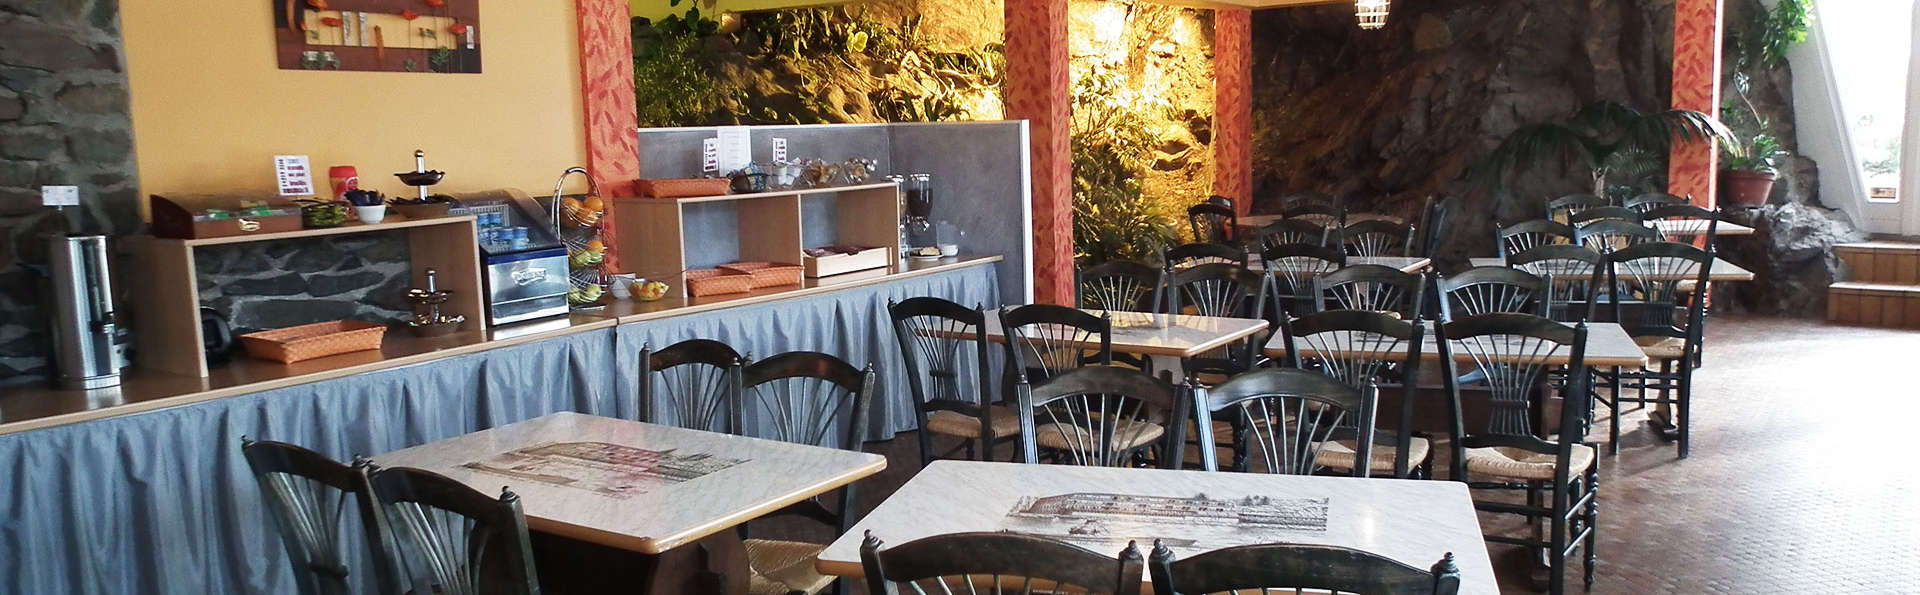 Hôtel Le Moulin Neuf - EDIT_restaurant.jpg